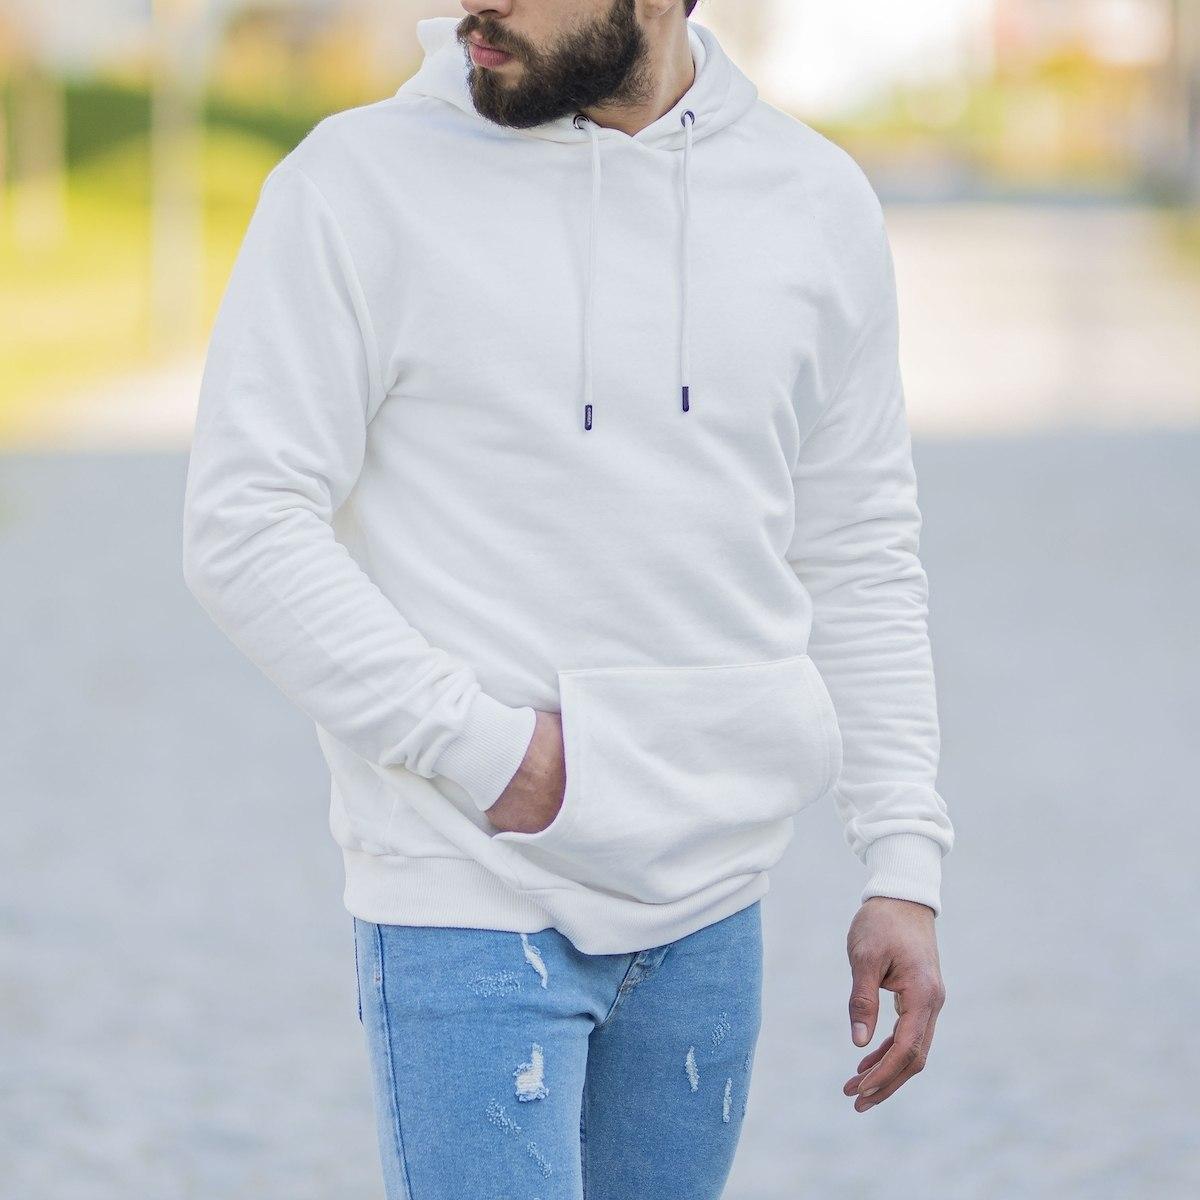 Men's Basic Hoodie In White